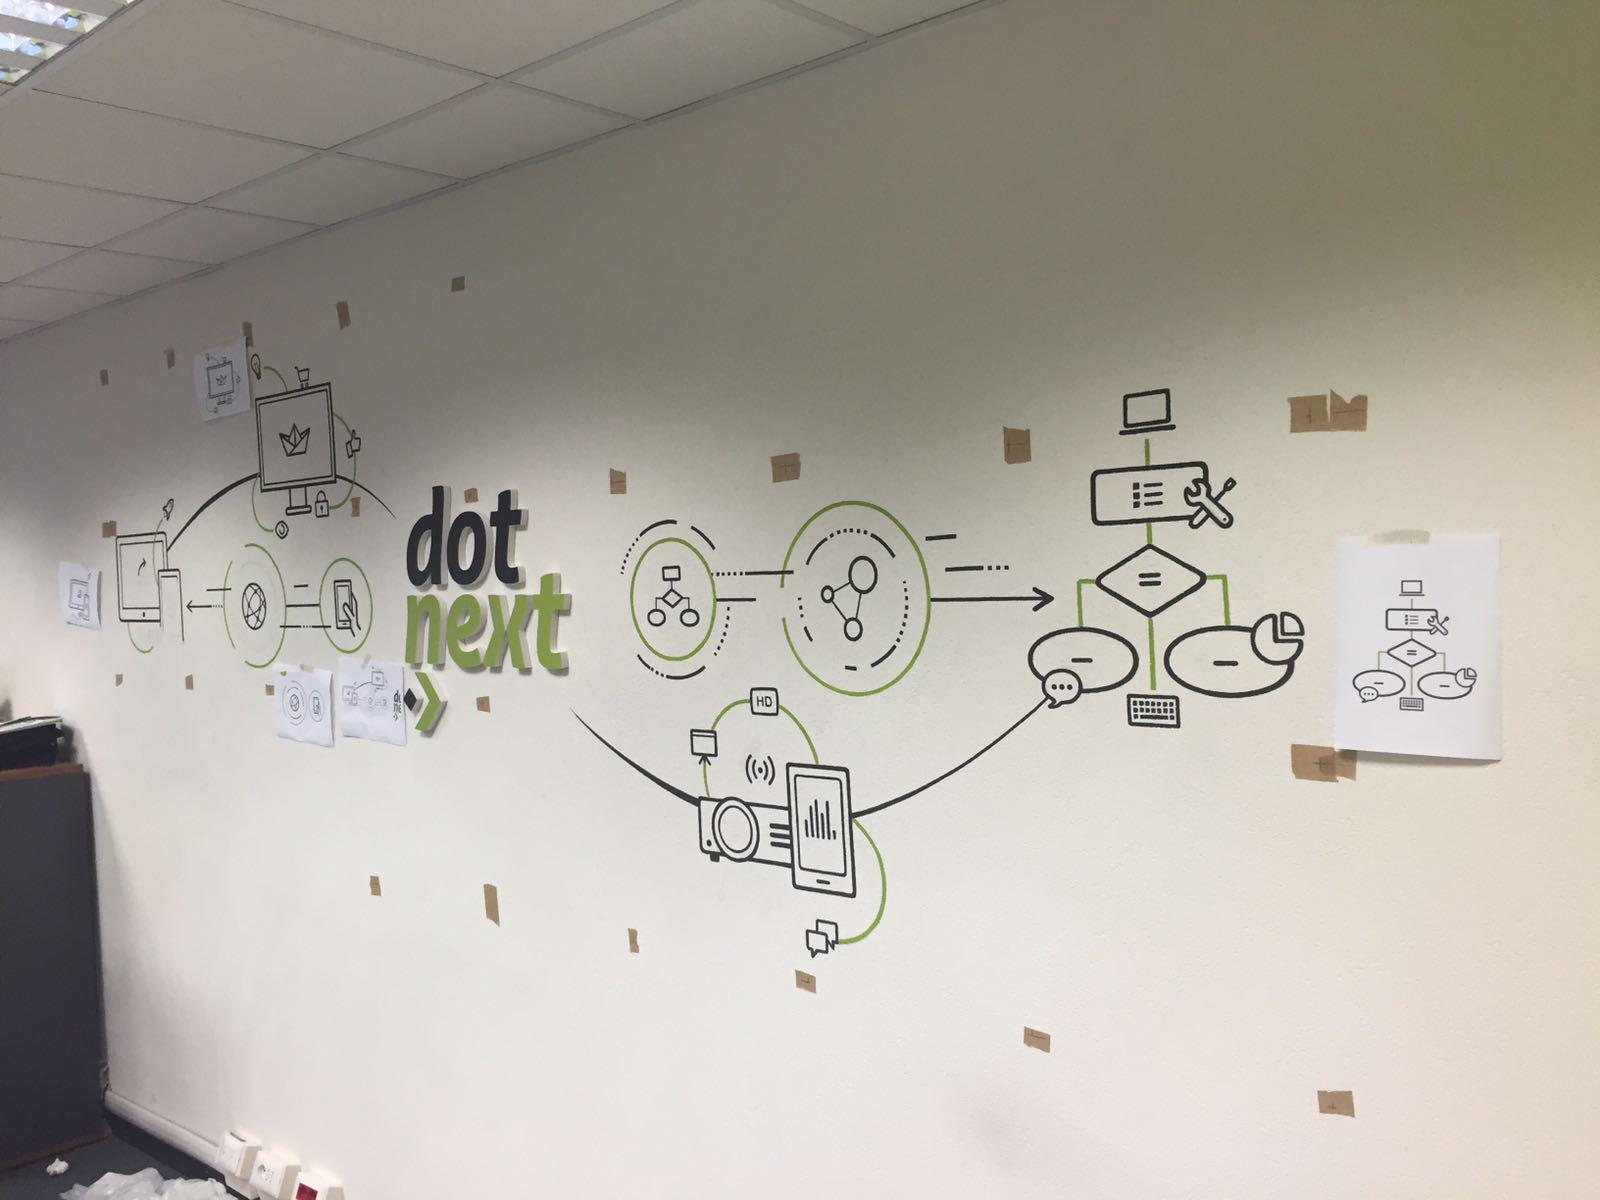 Il murales di Dot next